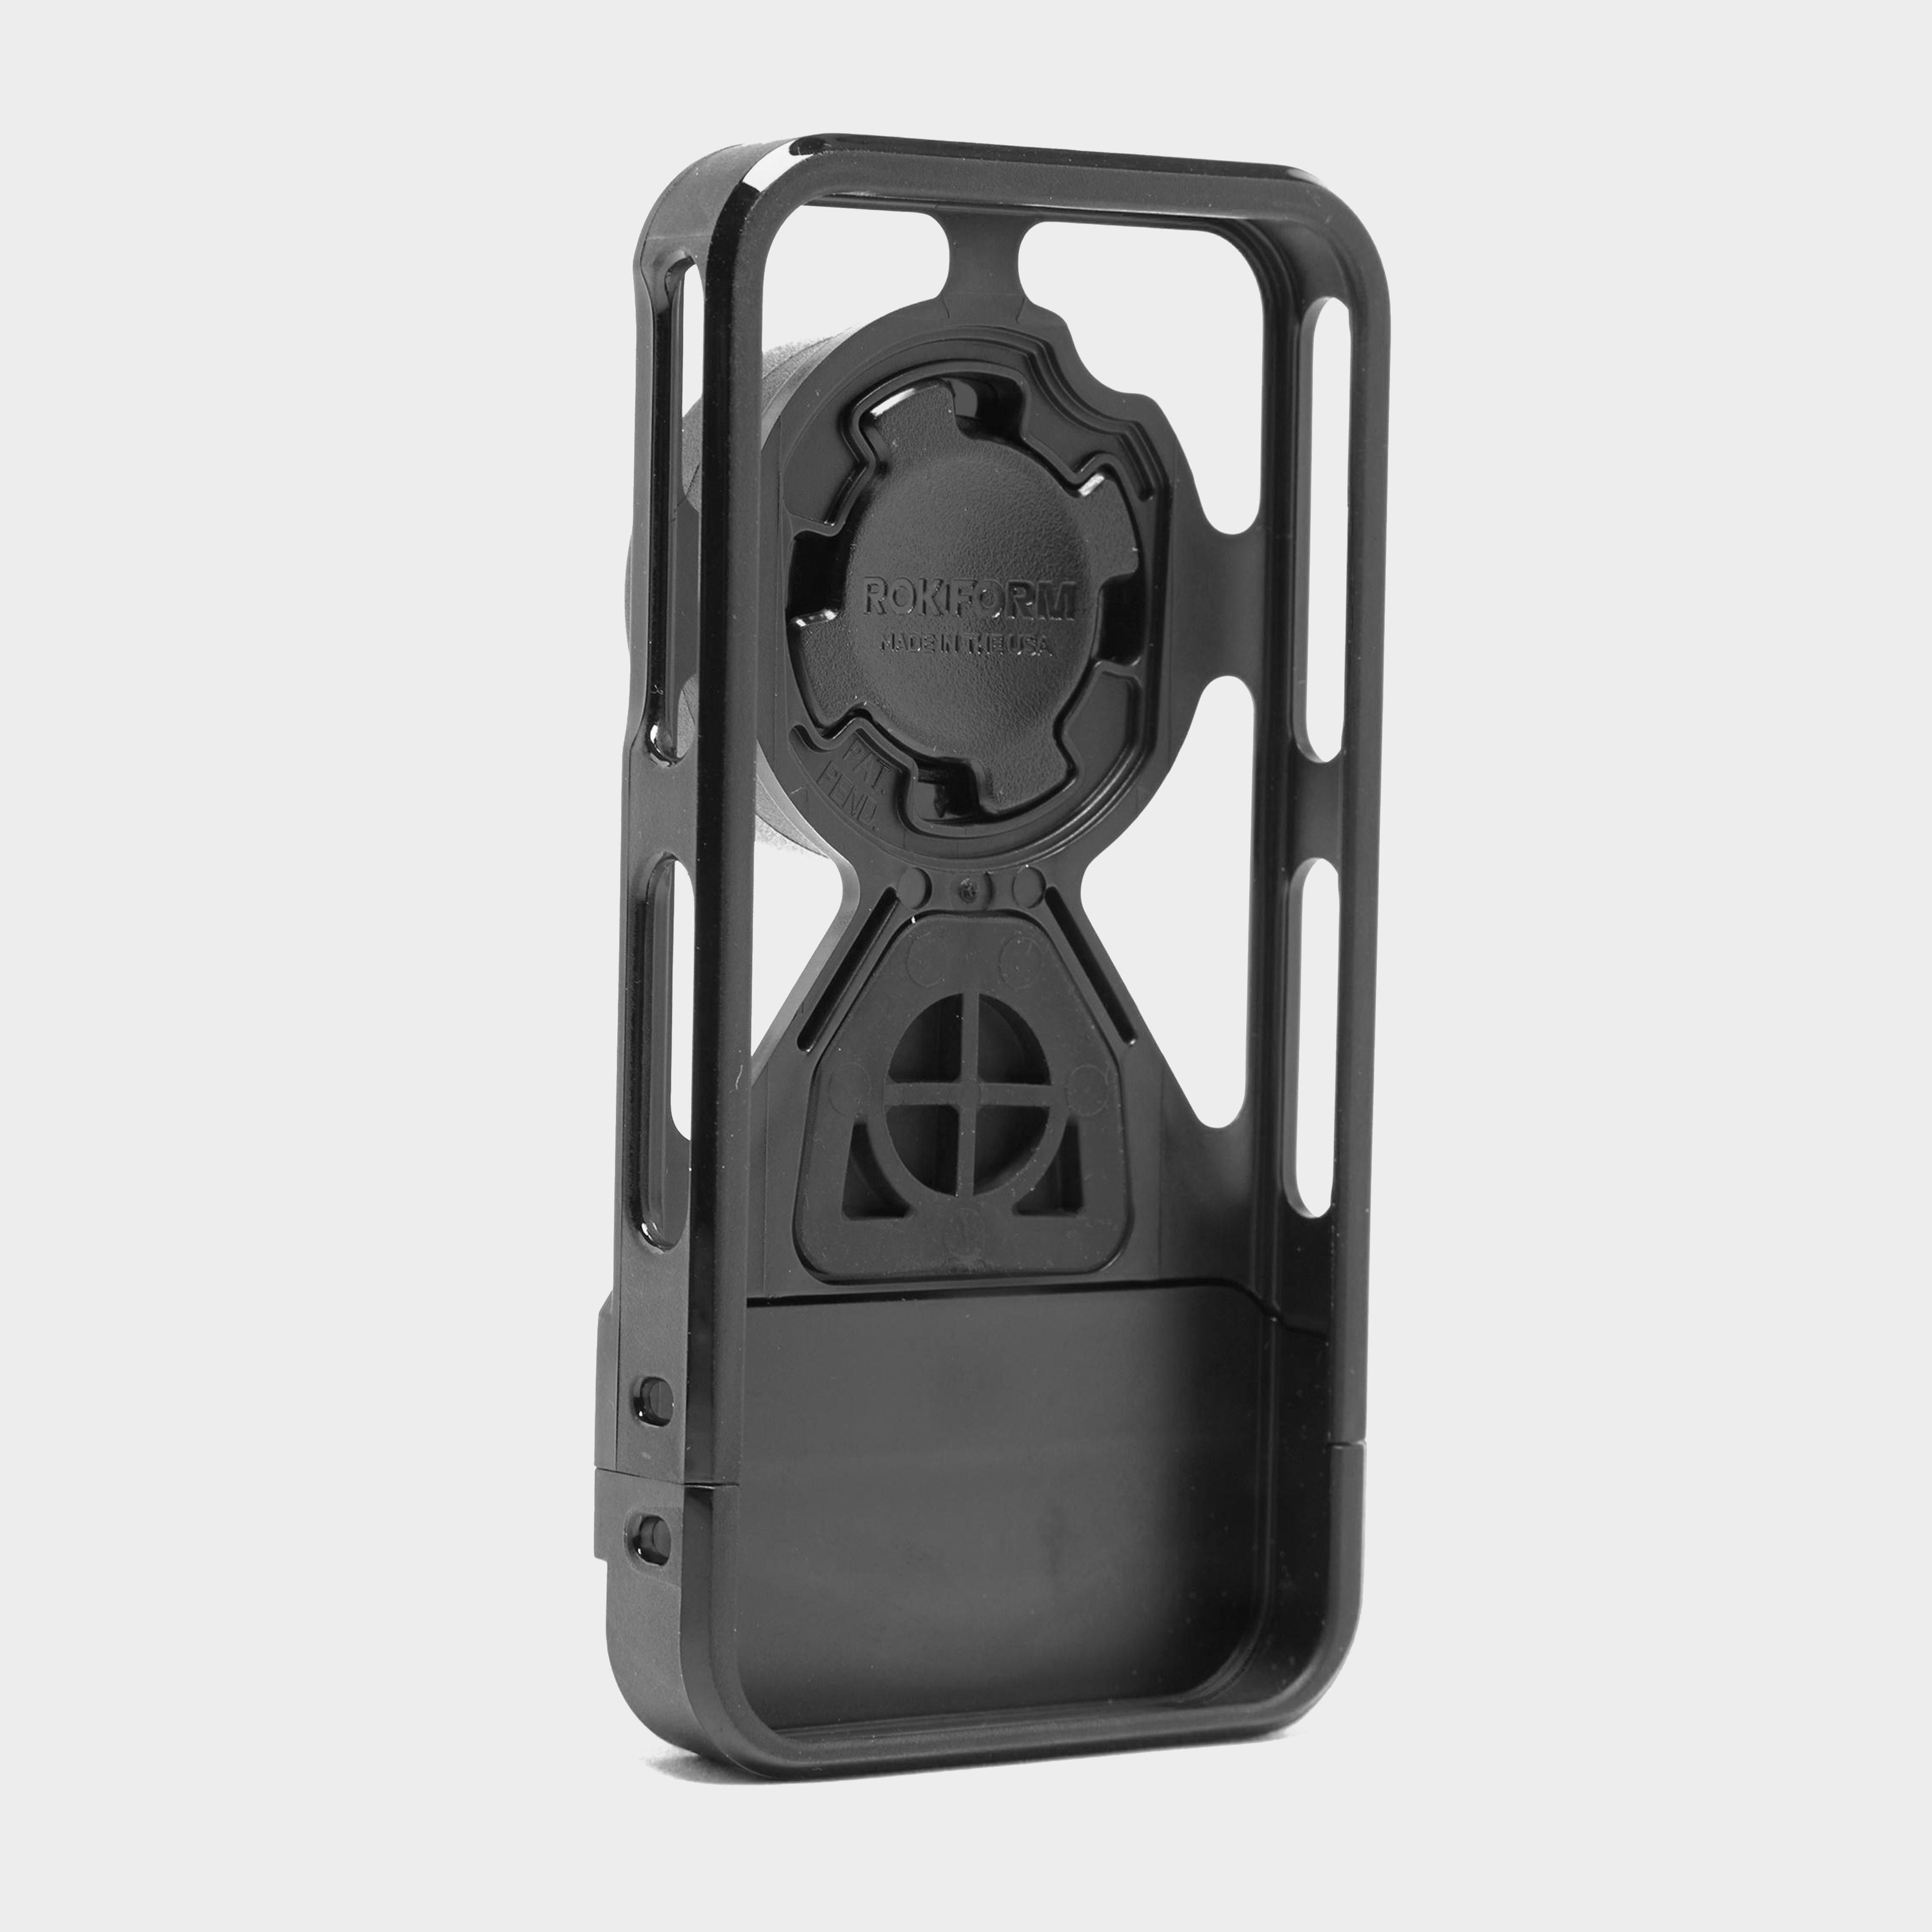 Rokform iPhone 4 Mountable Case, Black